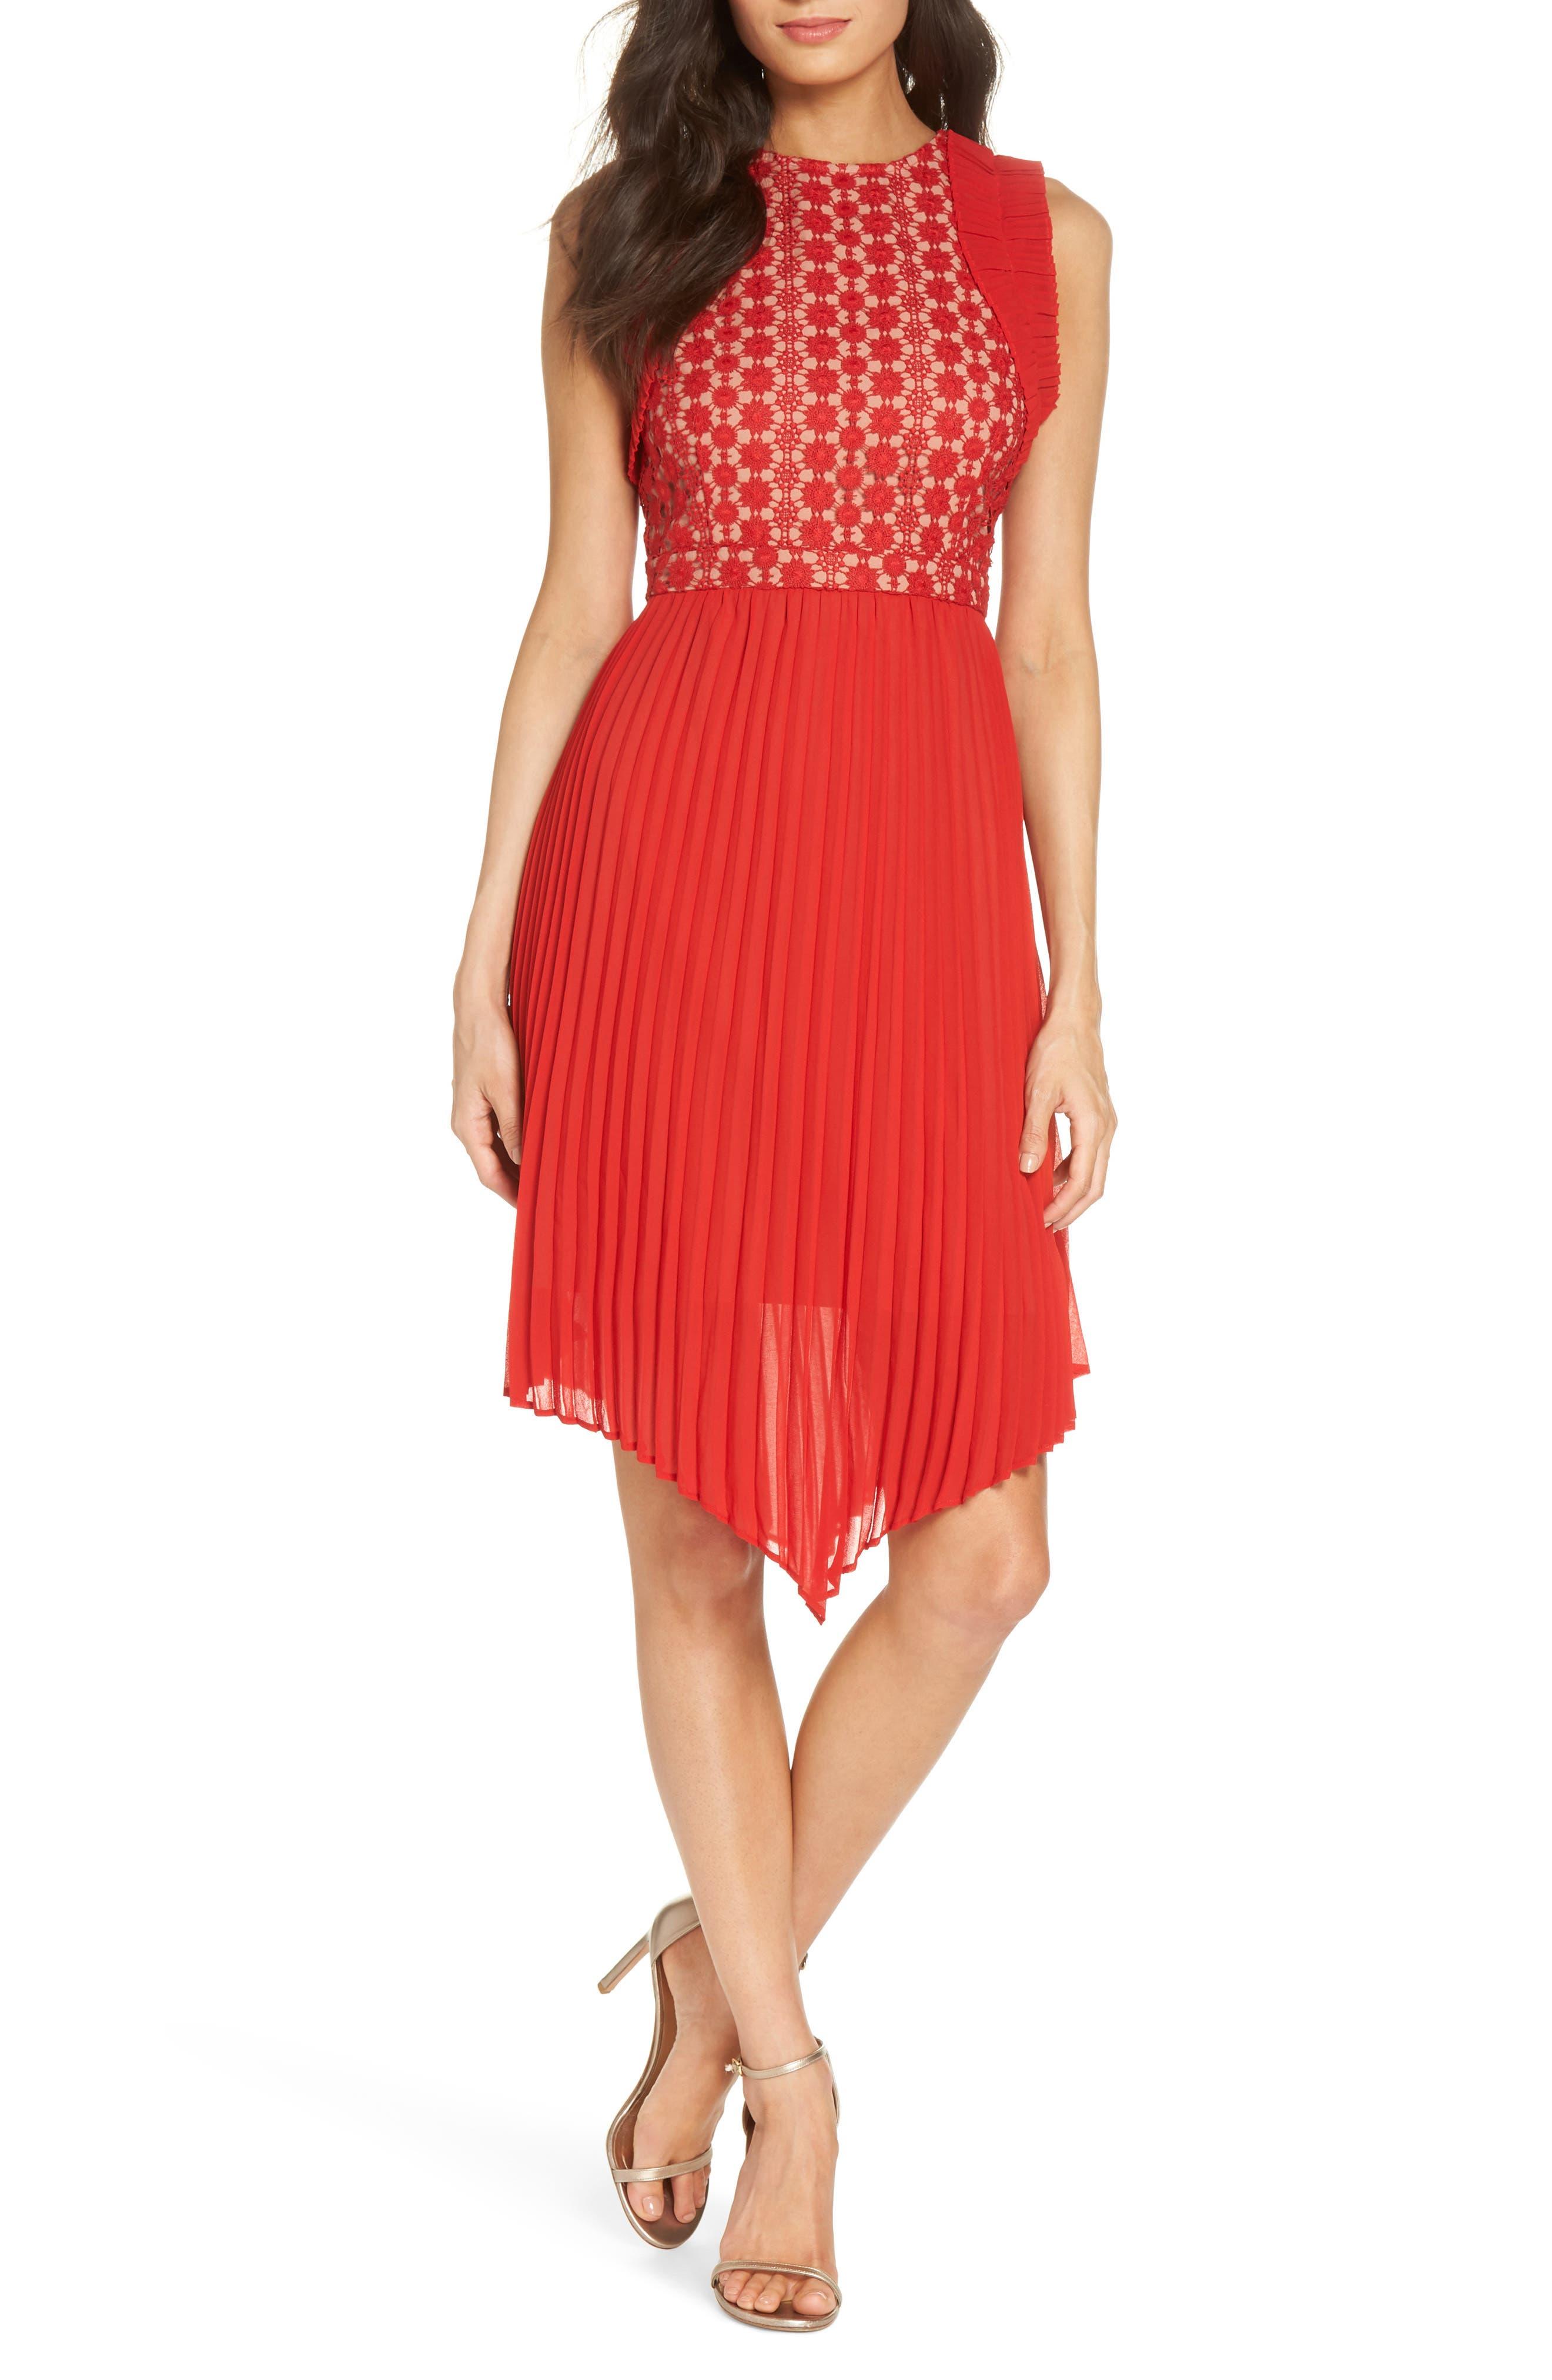 Nealea Pleated Sheath Dress,                             Main thumbnail 1, color,                             Red